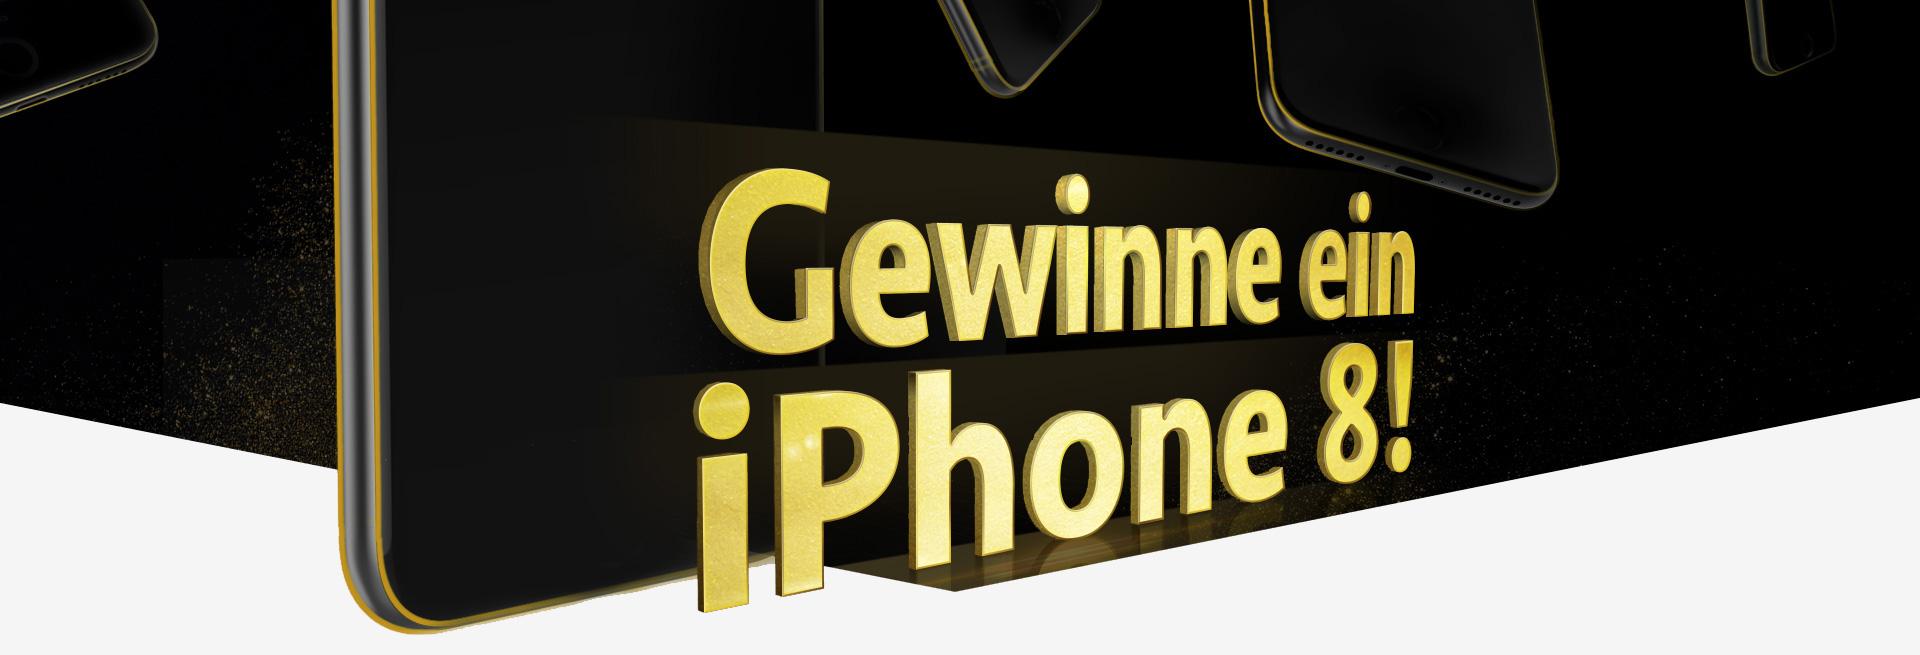 Win an iPhone 8